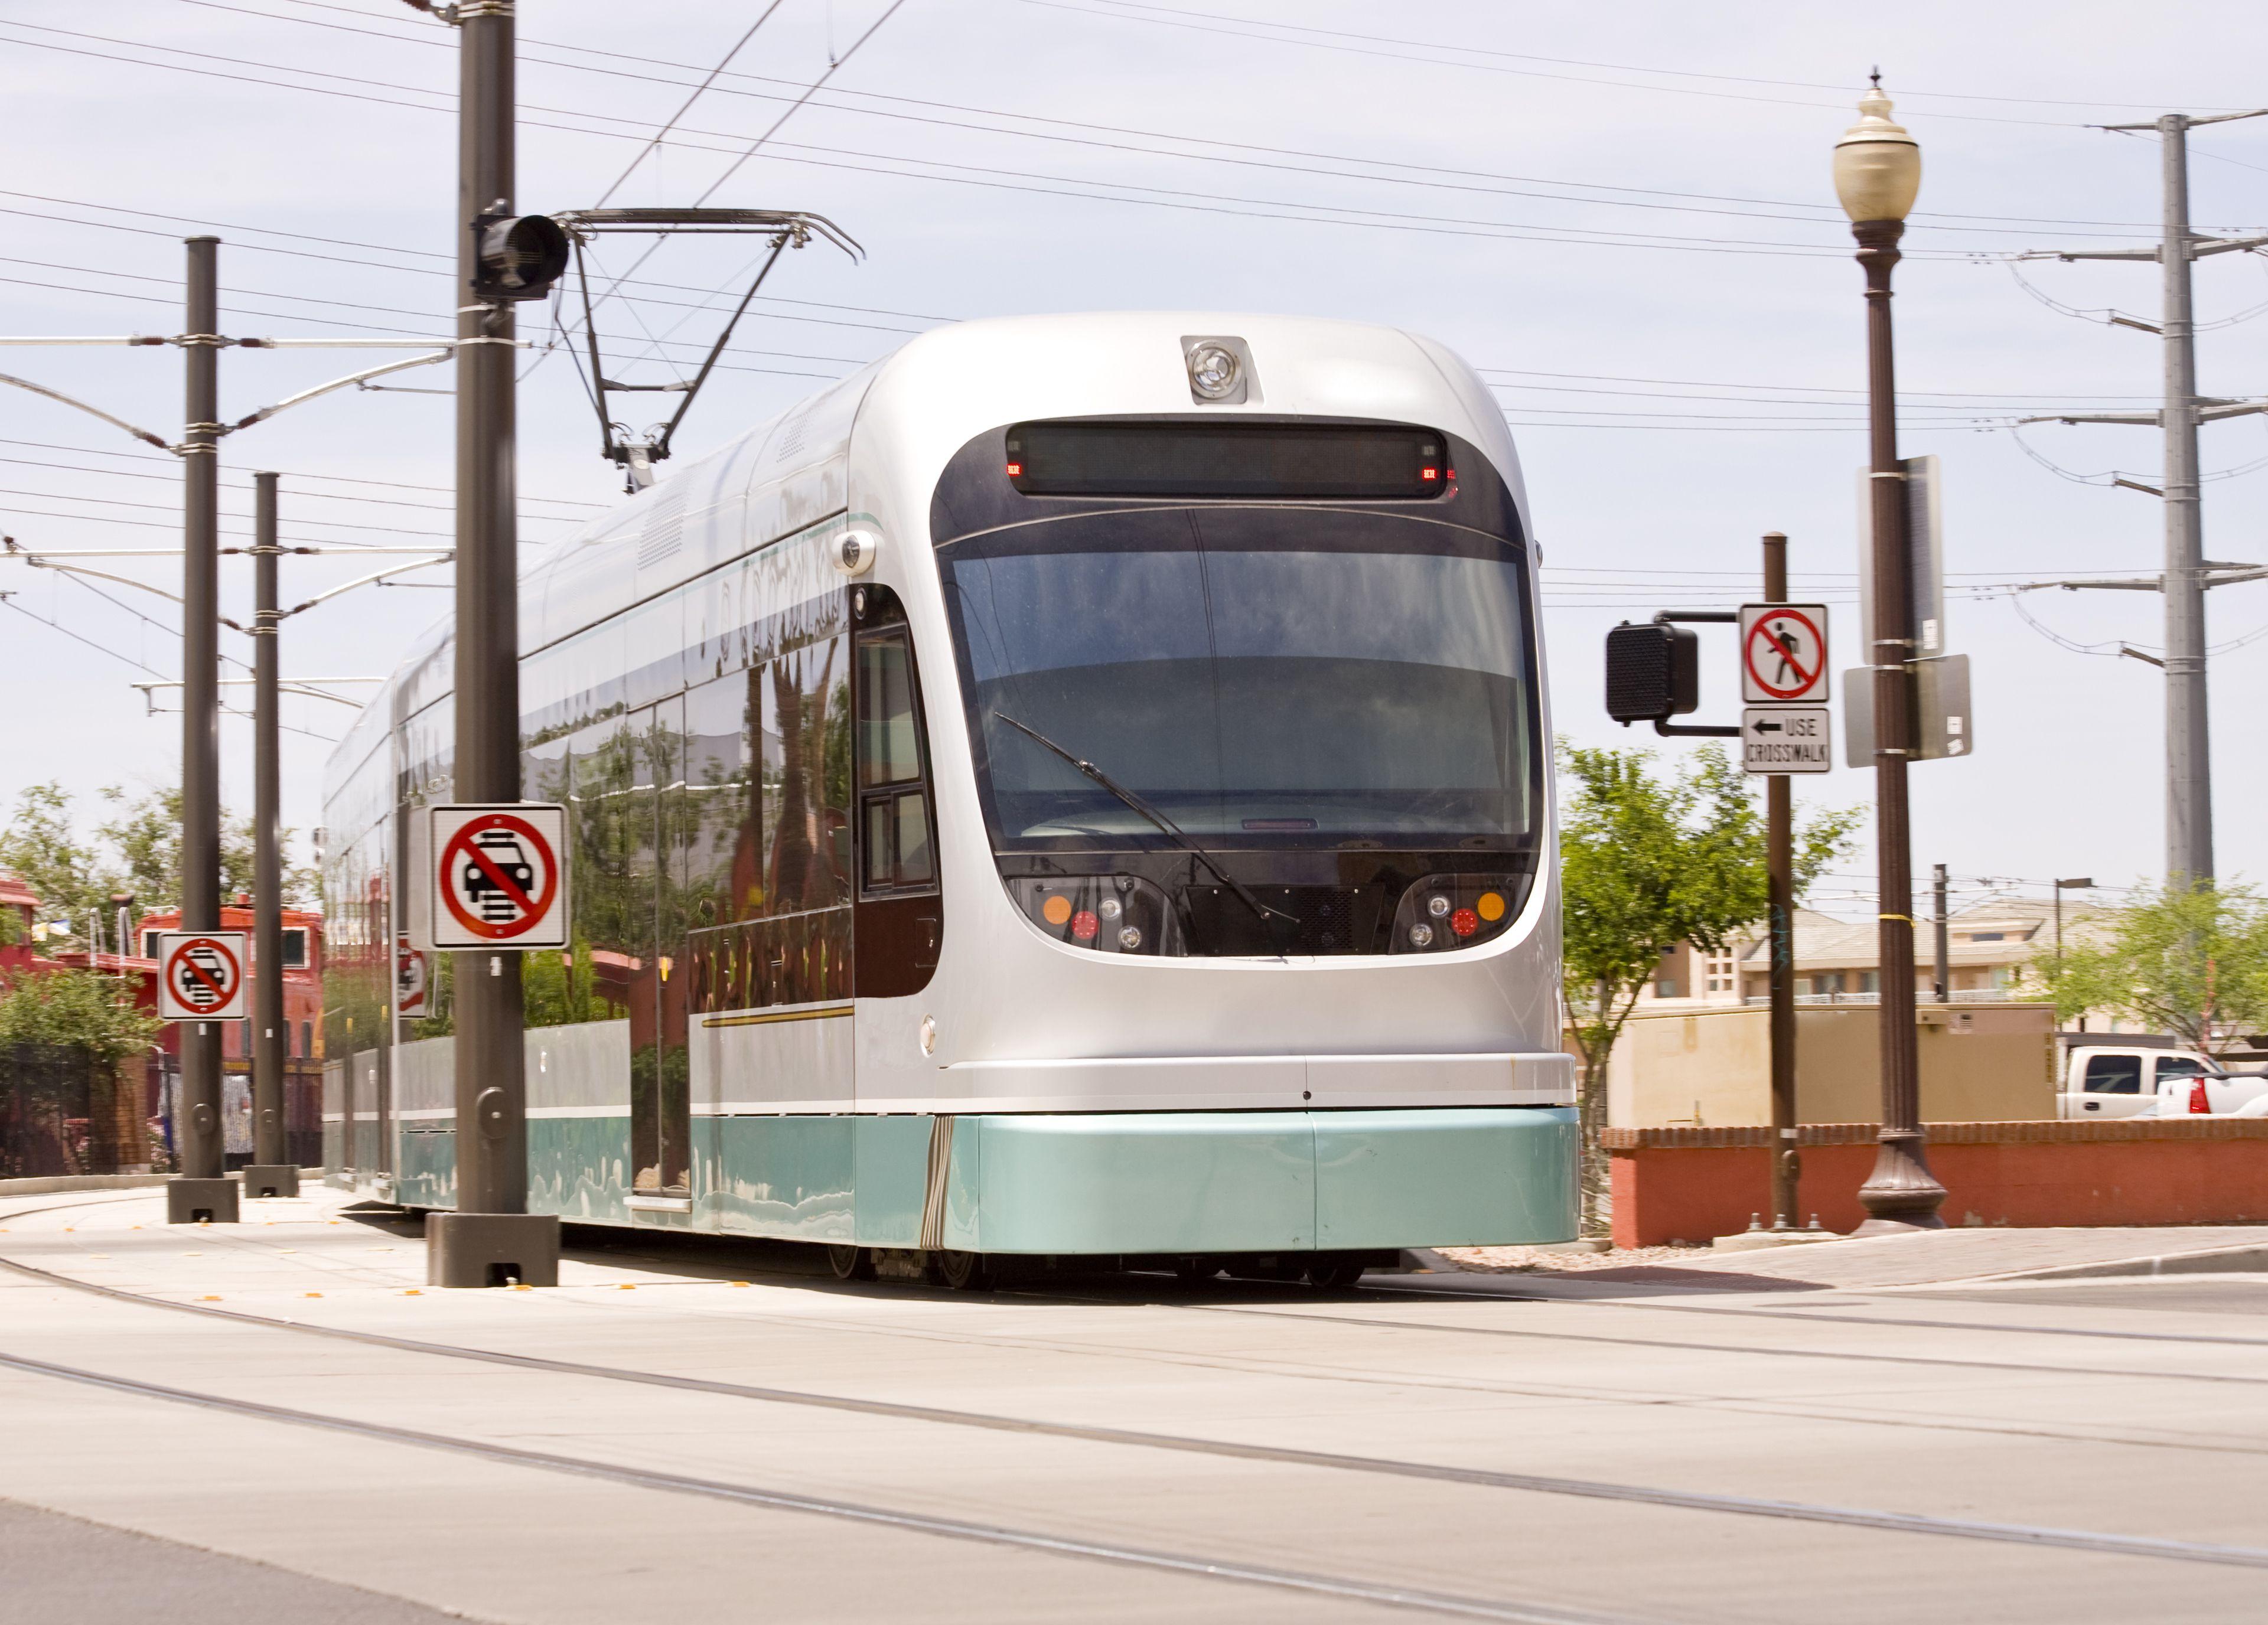 A green and white car of the Phoenix Metro Light Rail Train